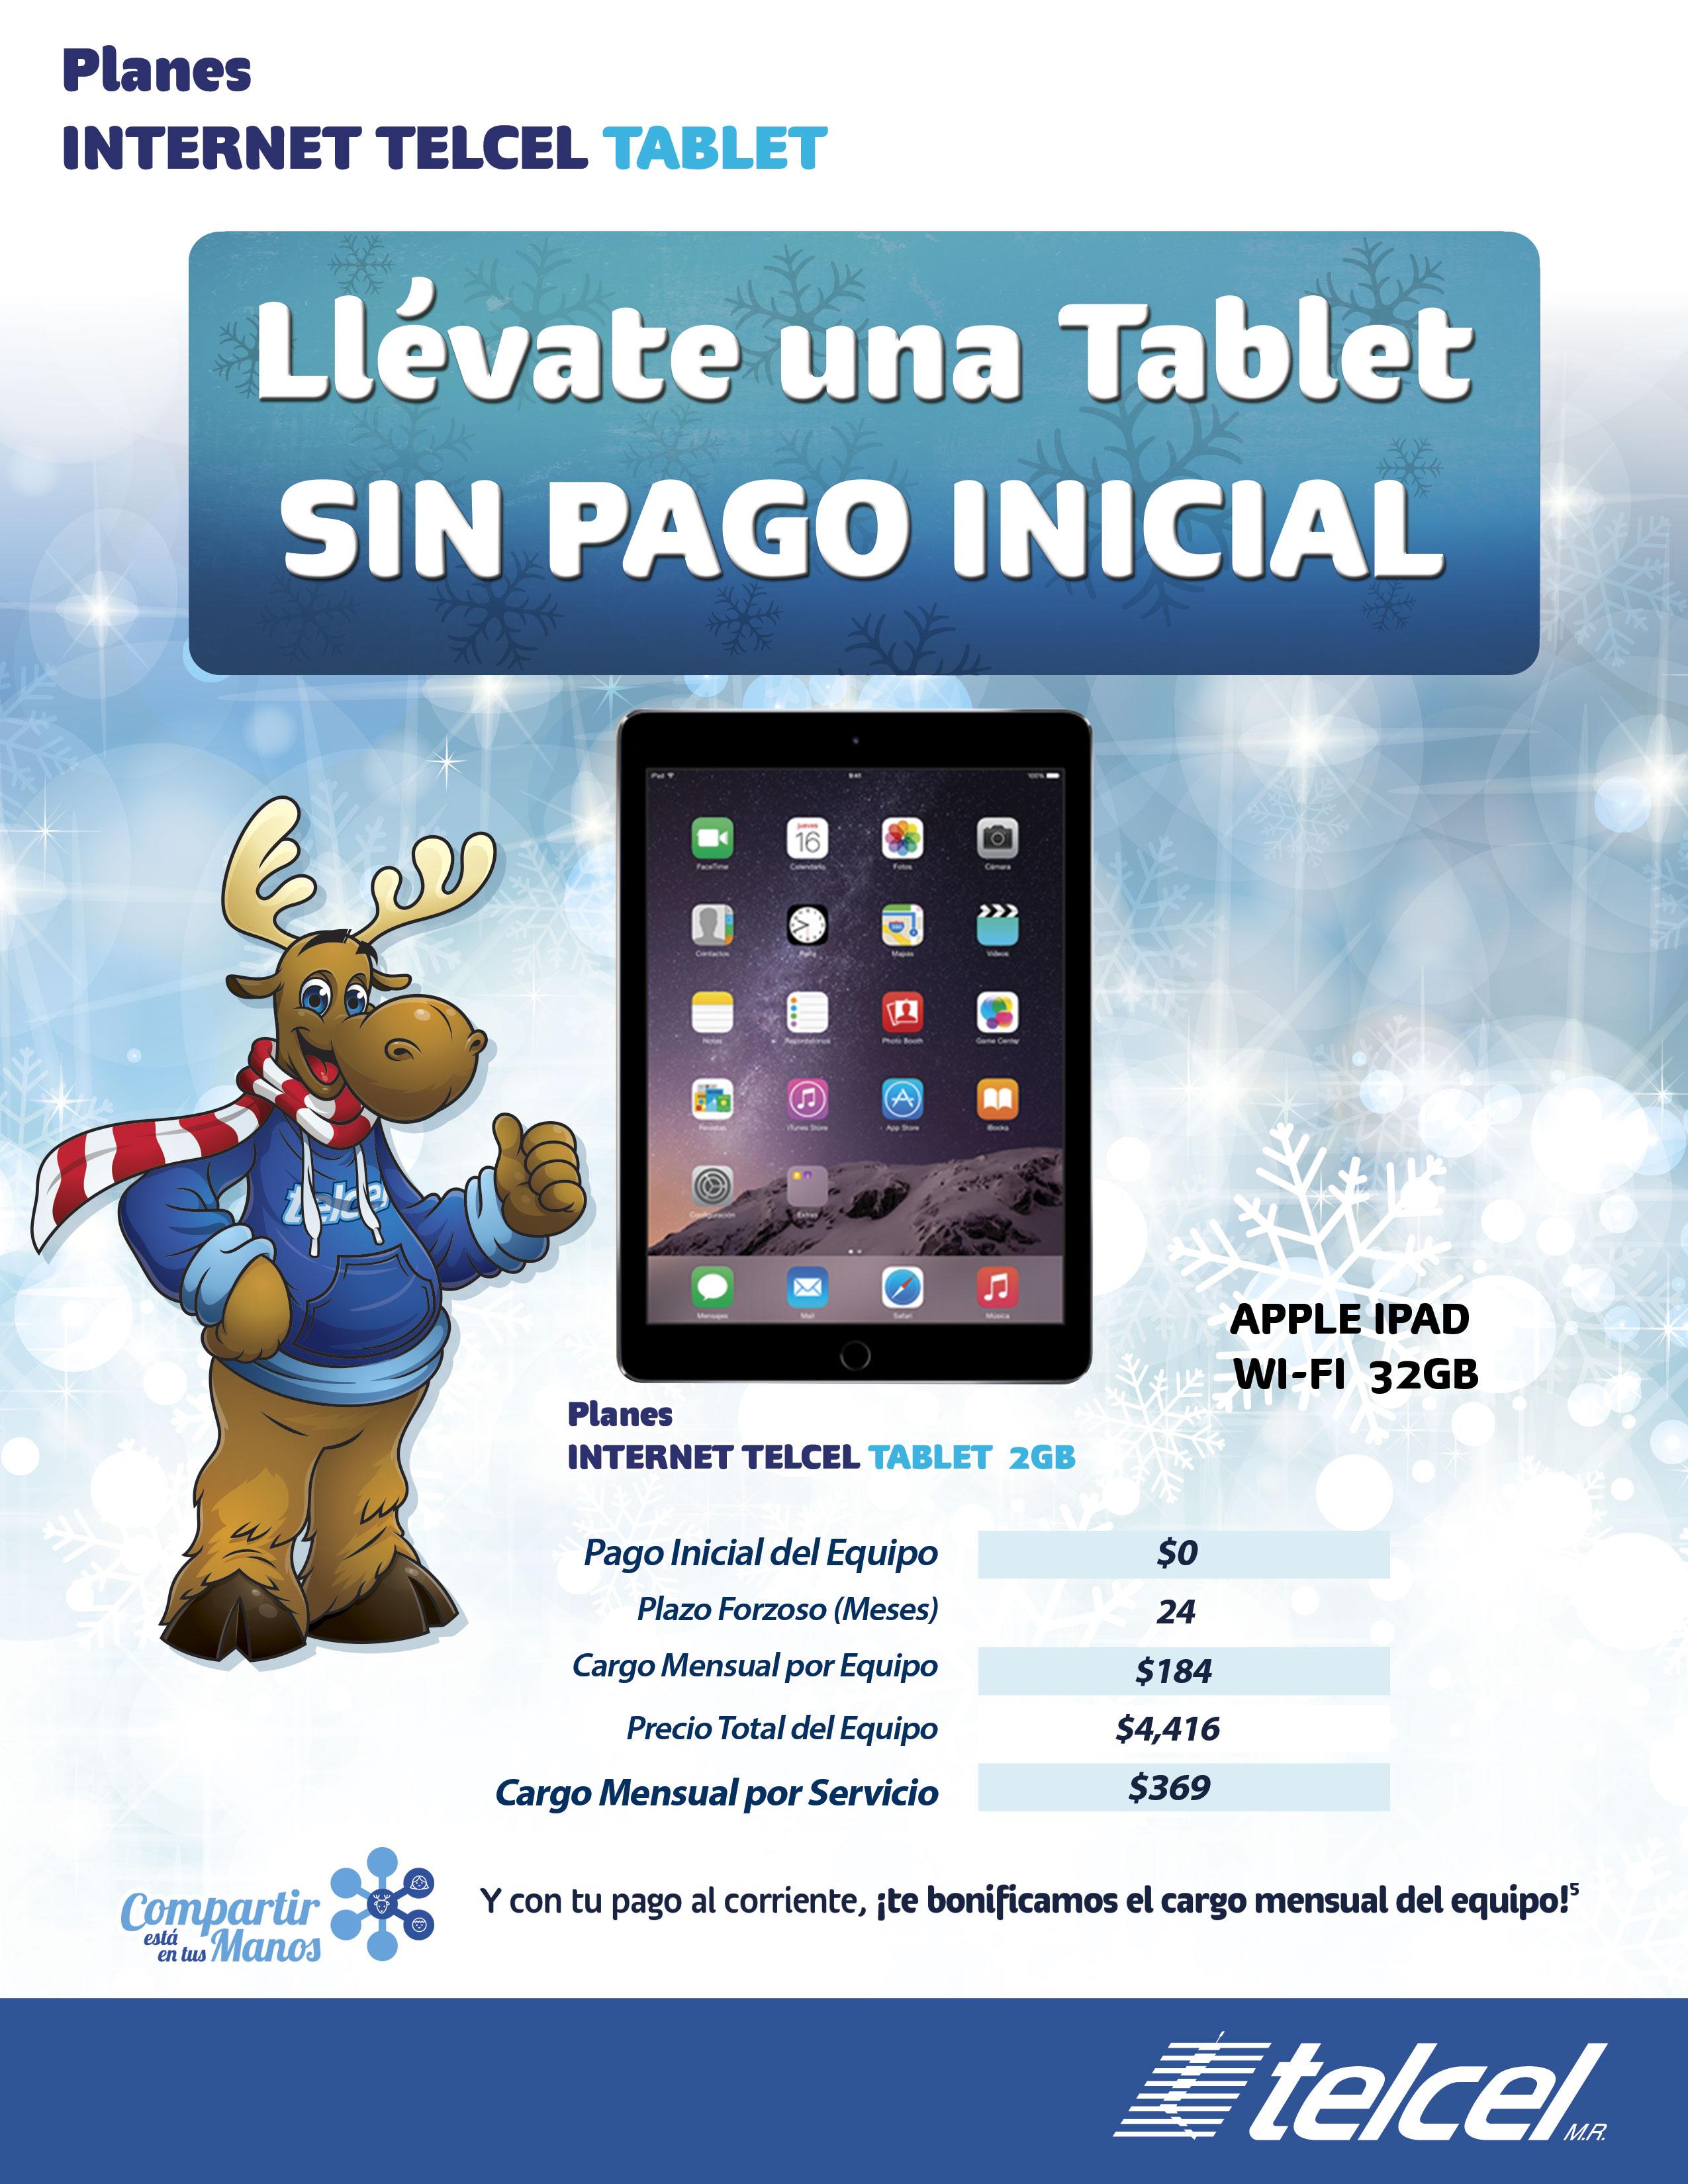 Telcel: iPad 32GB $0 en plan Telcel Internet Tablet de 2GB a 24 meses ($369 al mes)